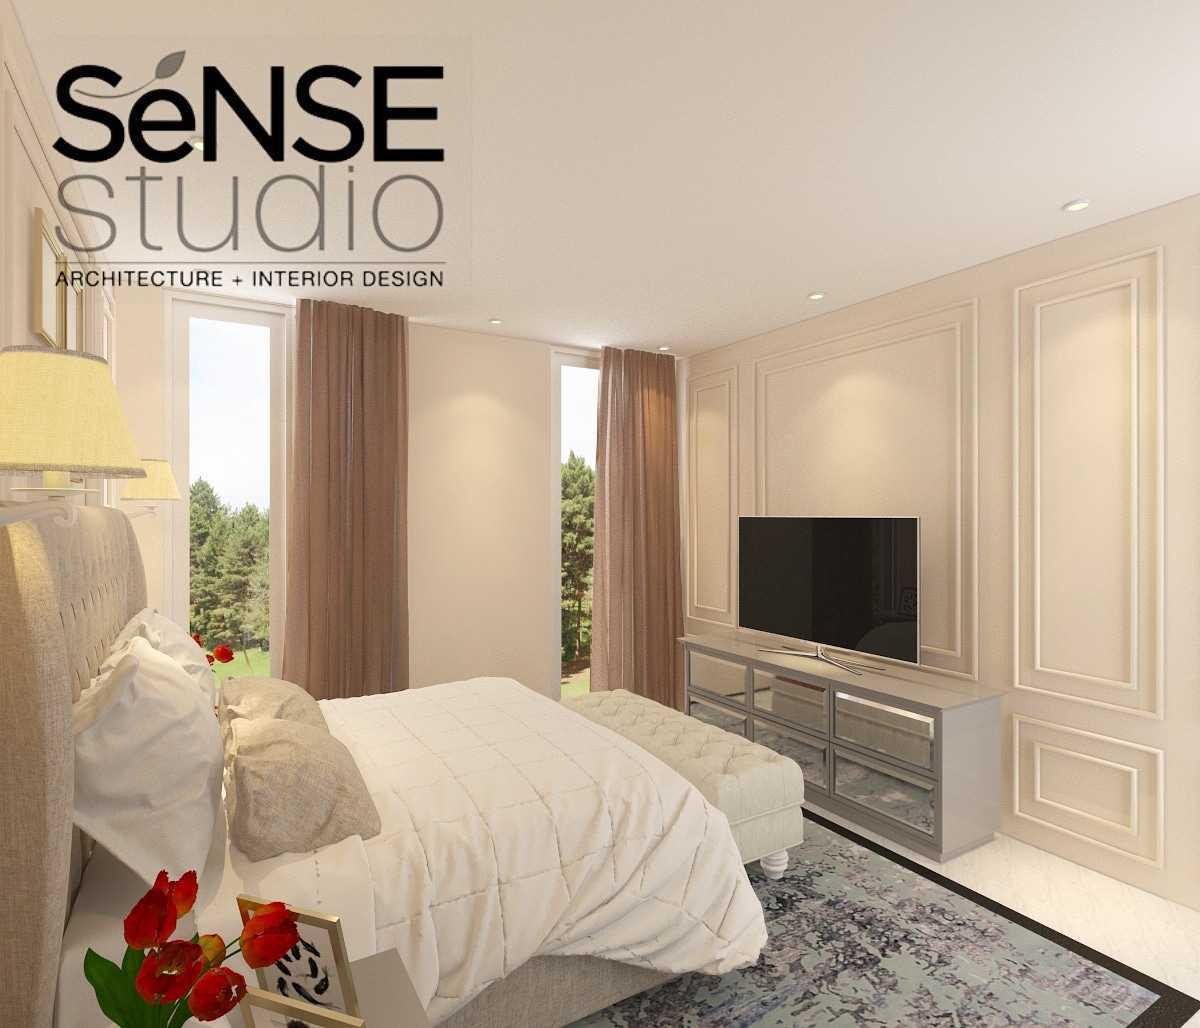 Sense Isle Studio Residence Surabaya Surabaya, Kota Sby, Jawa Timur, Indonesia Surabaya, Kota Sby, Jawa Timur, Indonesia Sense-Studio-Residence-Surabaya   80440